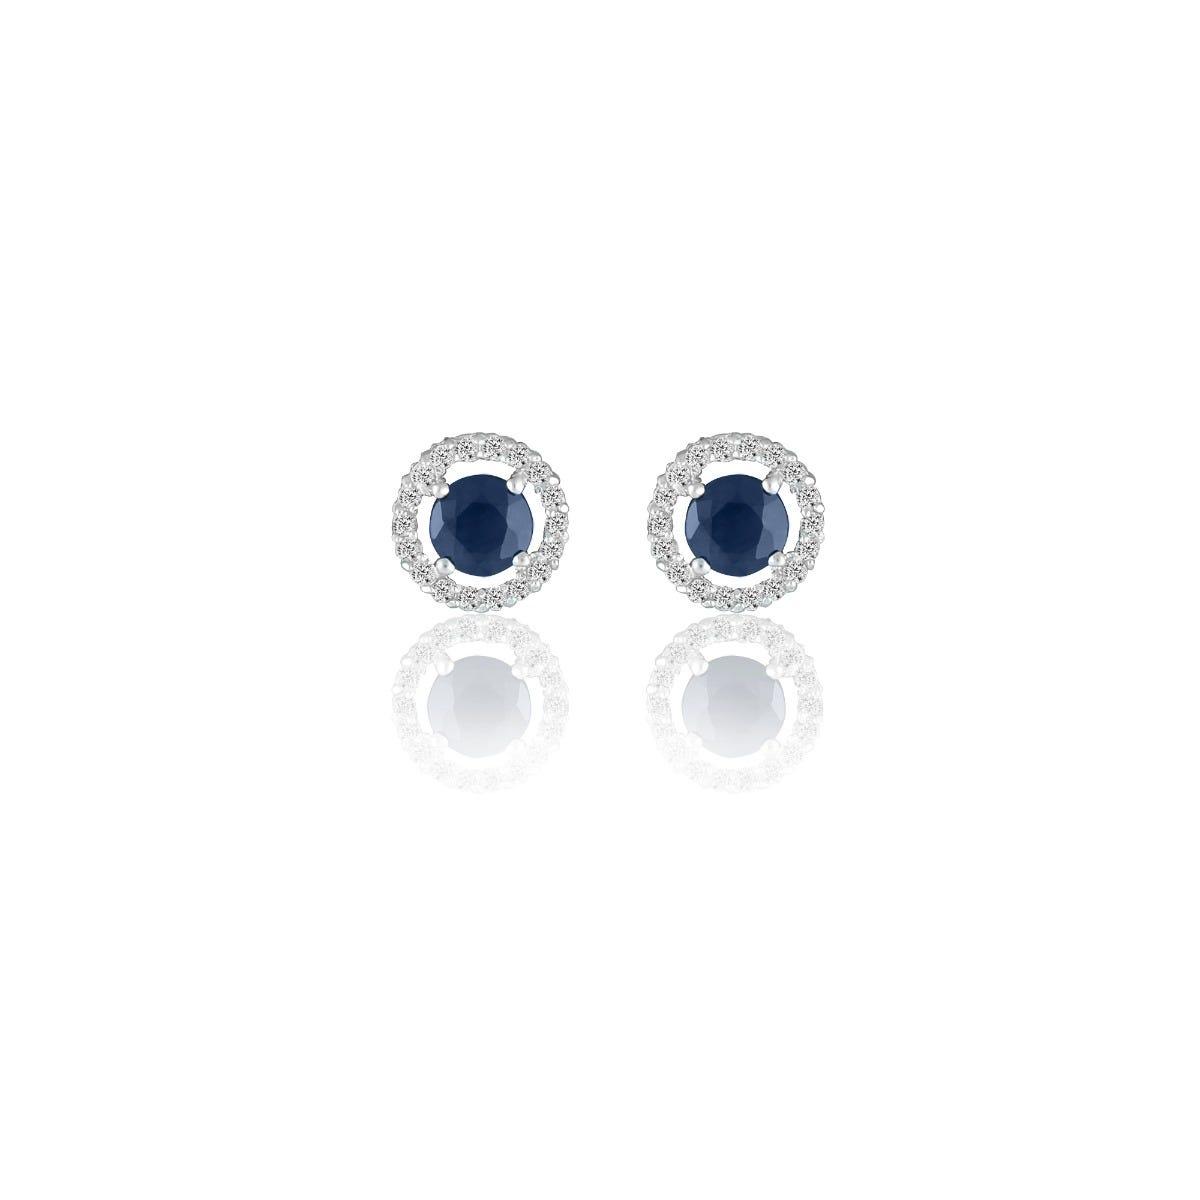 Sapphire & Diamond Halo Stud Earrings in 14k White Gold